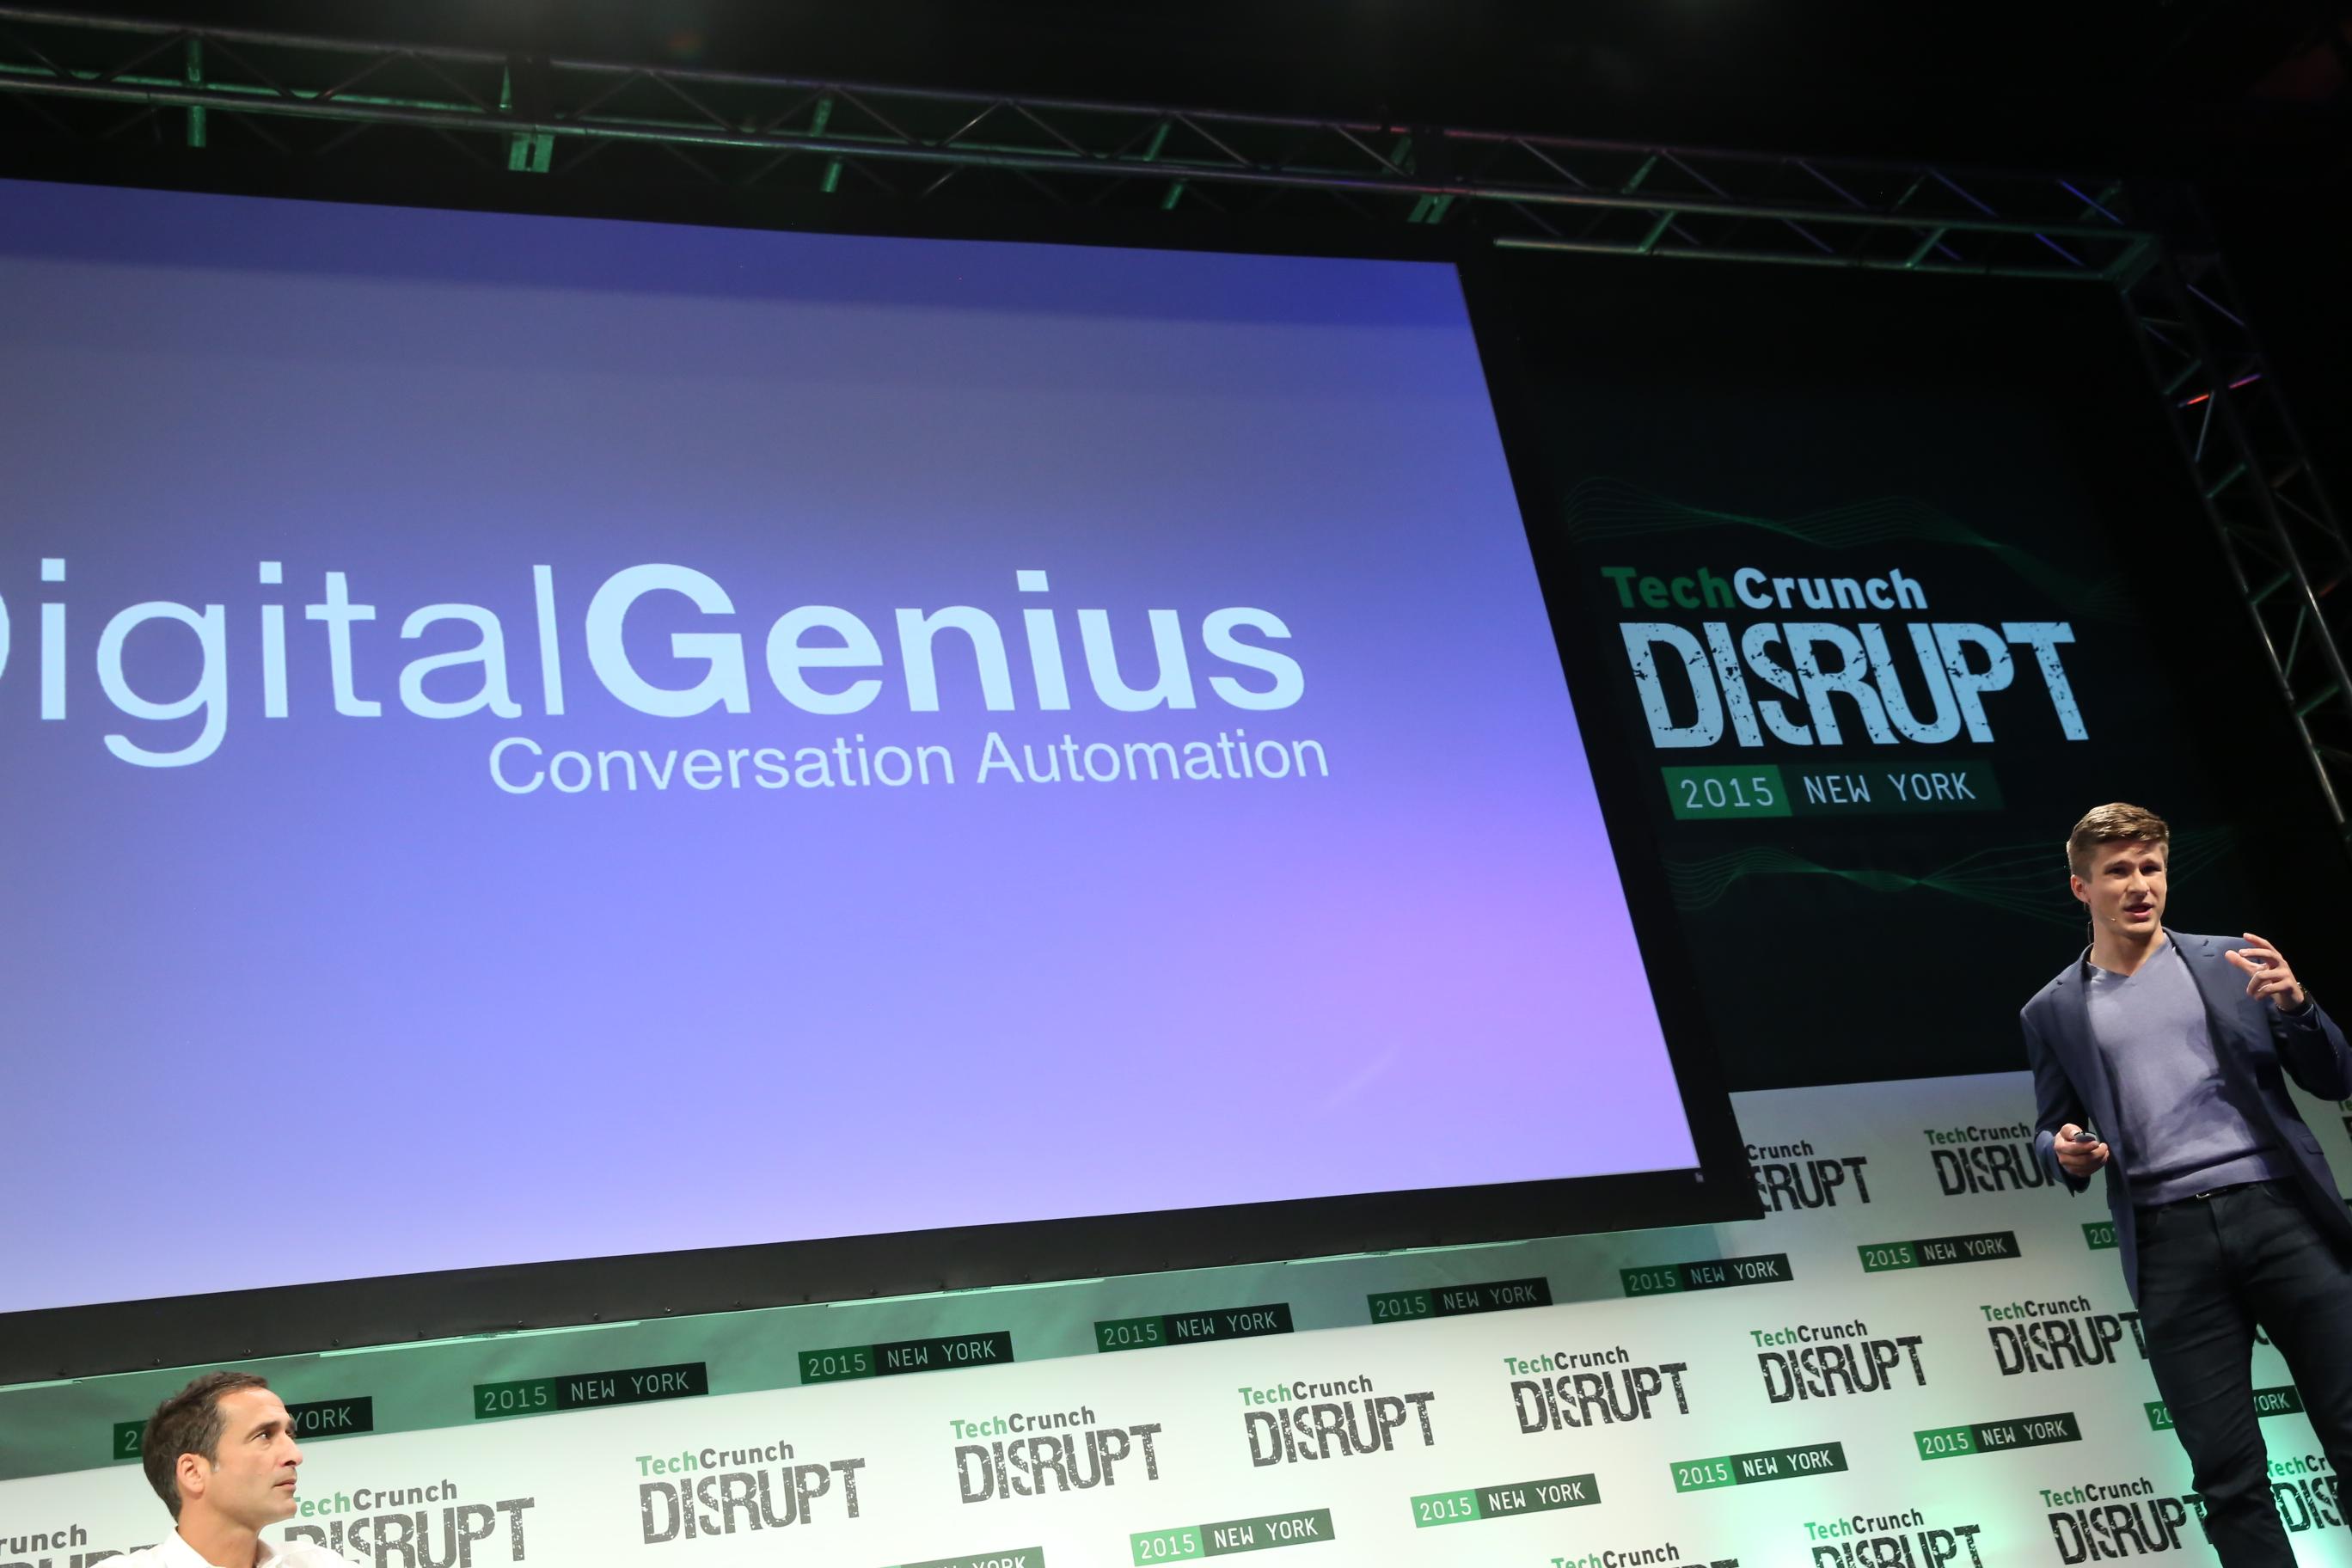 DigitalGenius raises $14.75 million Series A for AI-based customer service solution